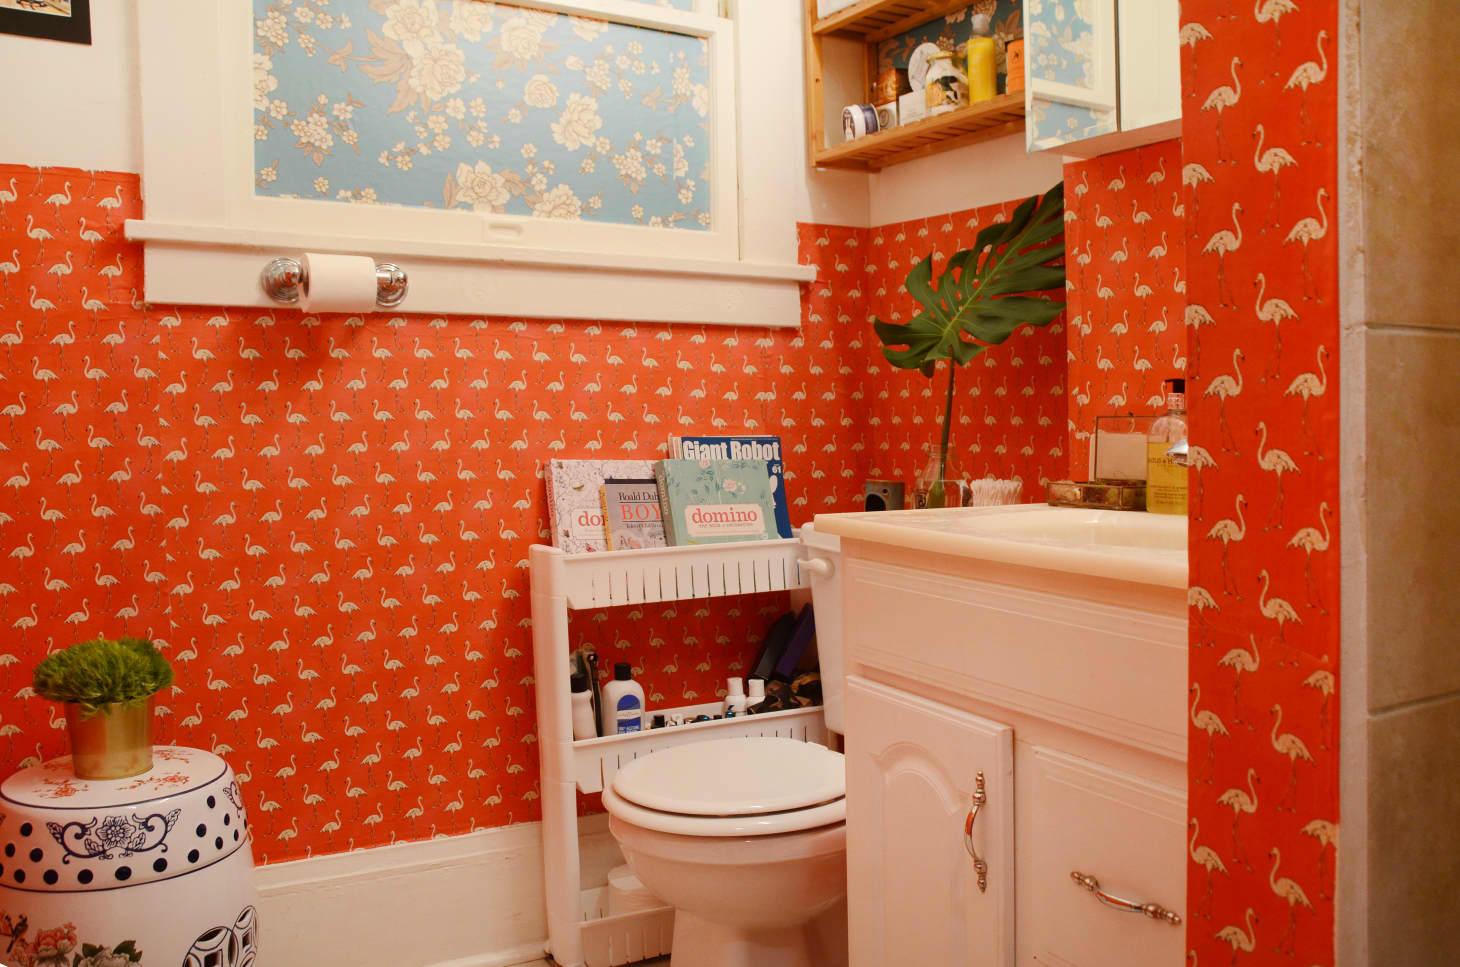 25 Small Bathroom Storage & Design Ideas - Storage ... on Small Apartment Bathroom  id=89634